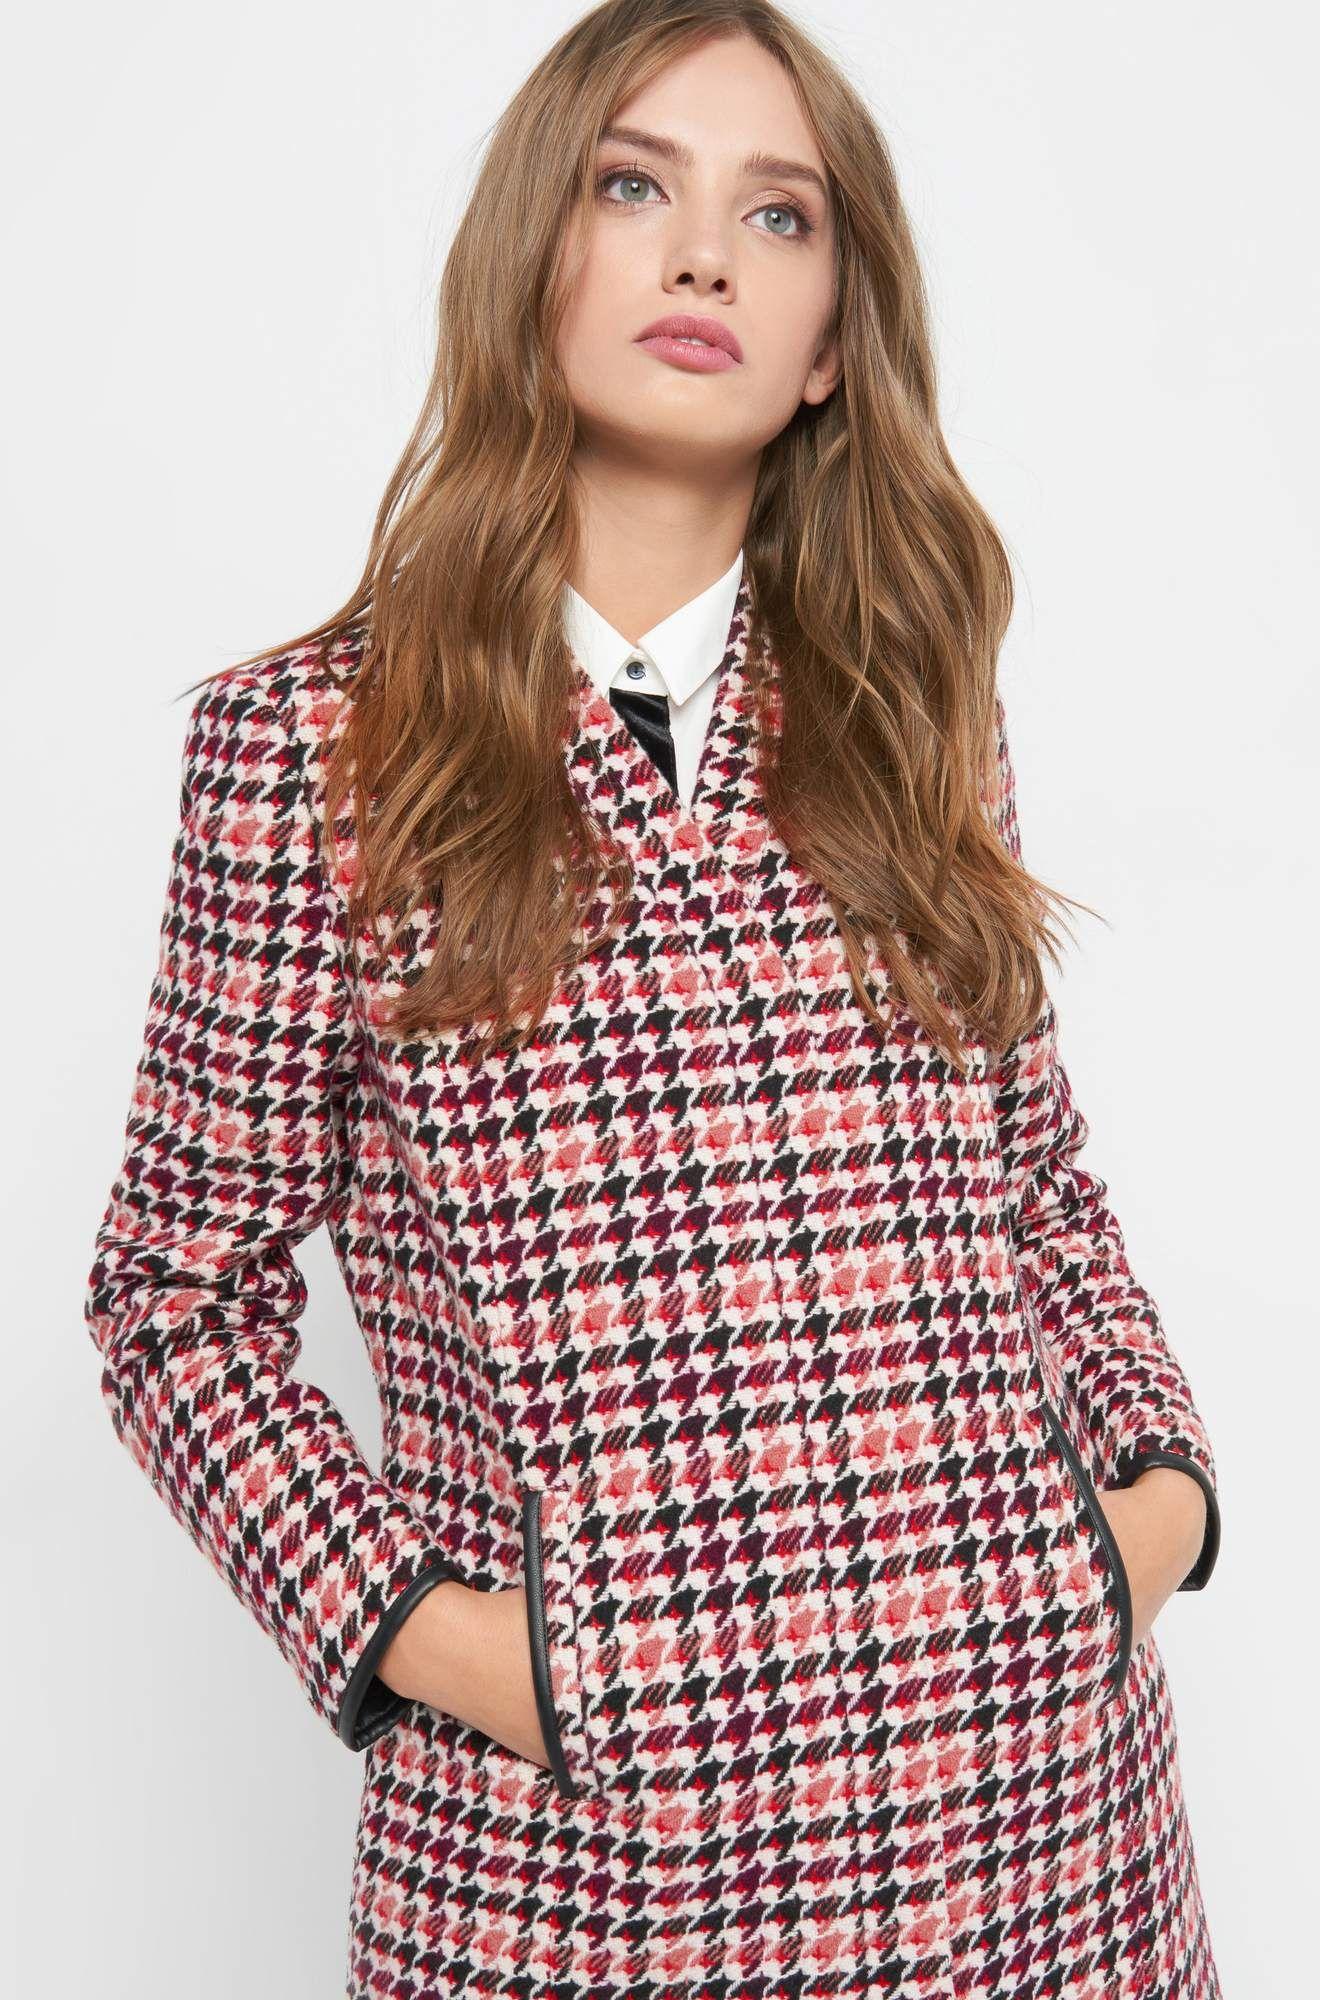 Kurzmantel aus Pepita-Muster   Jacken   Mäntel Damen   Clothes for ... 7c2fb59be7